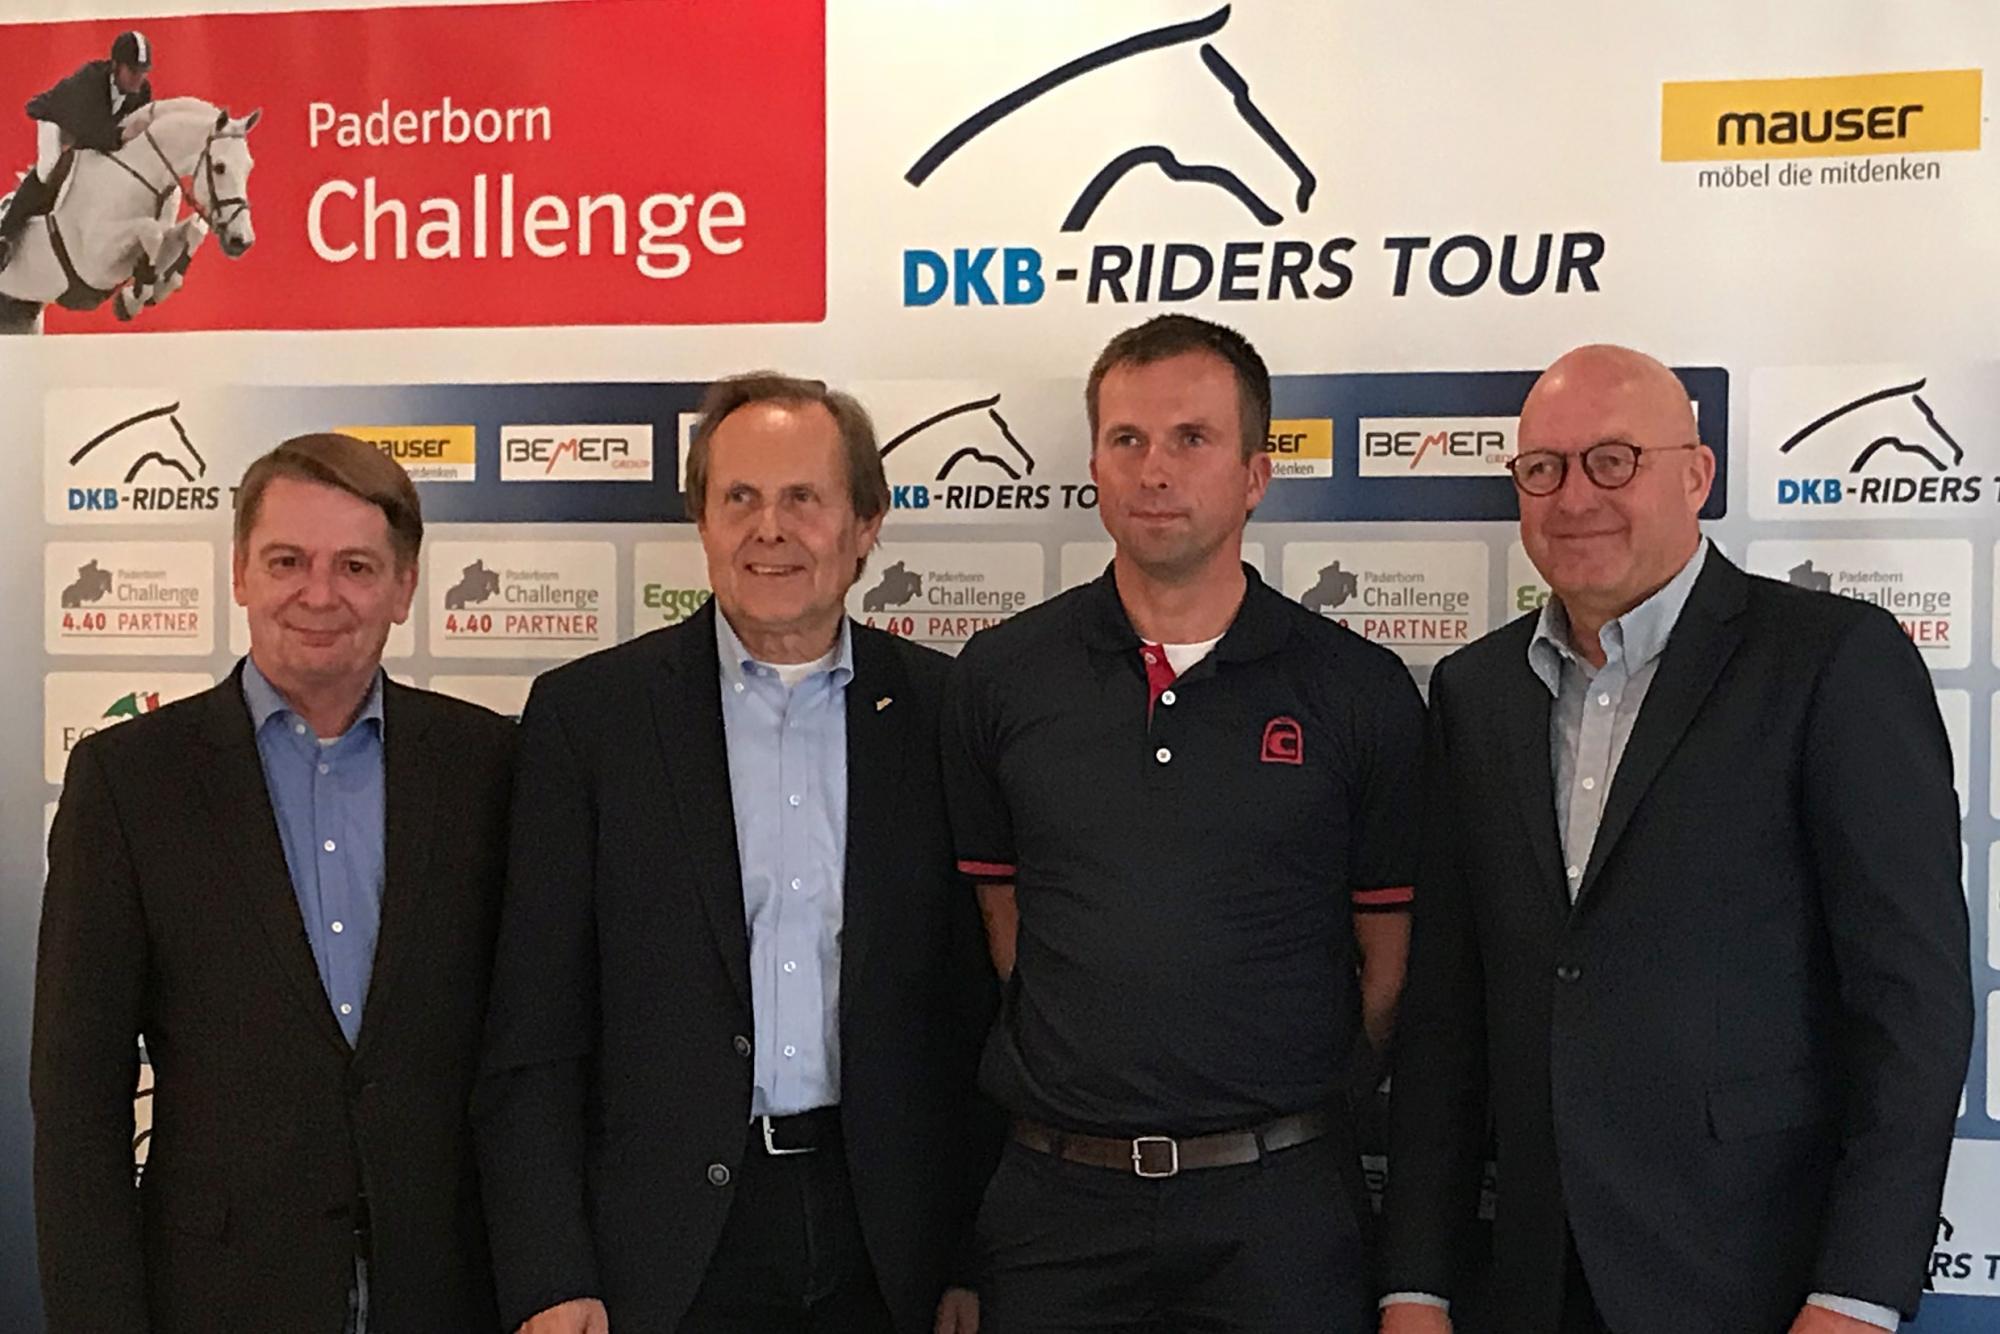 Paderborn Challenge, DKB-Riders Tour, Henrik Griese